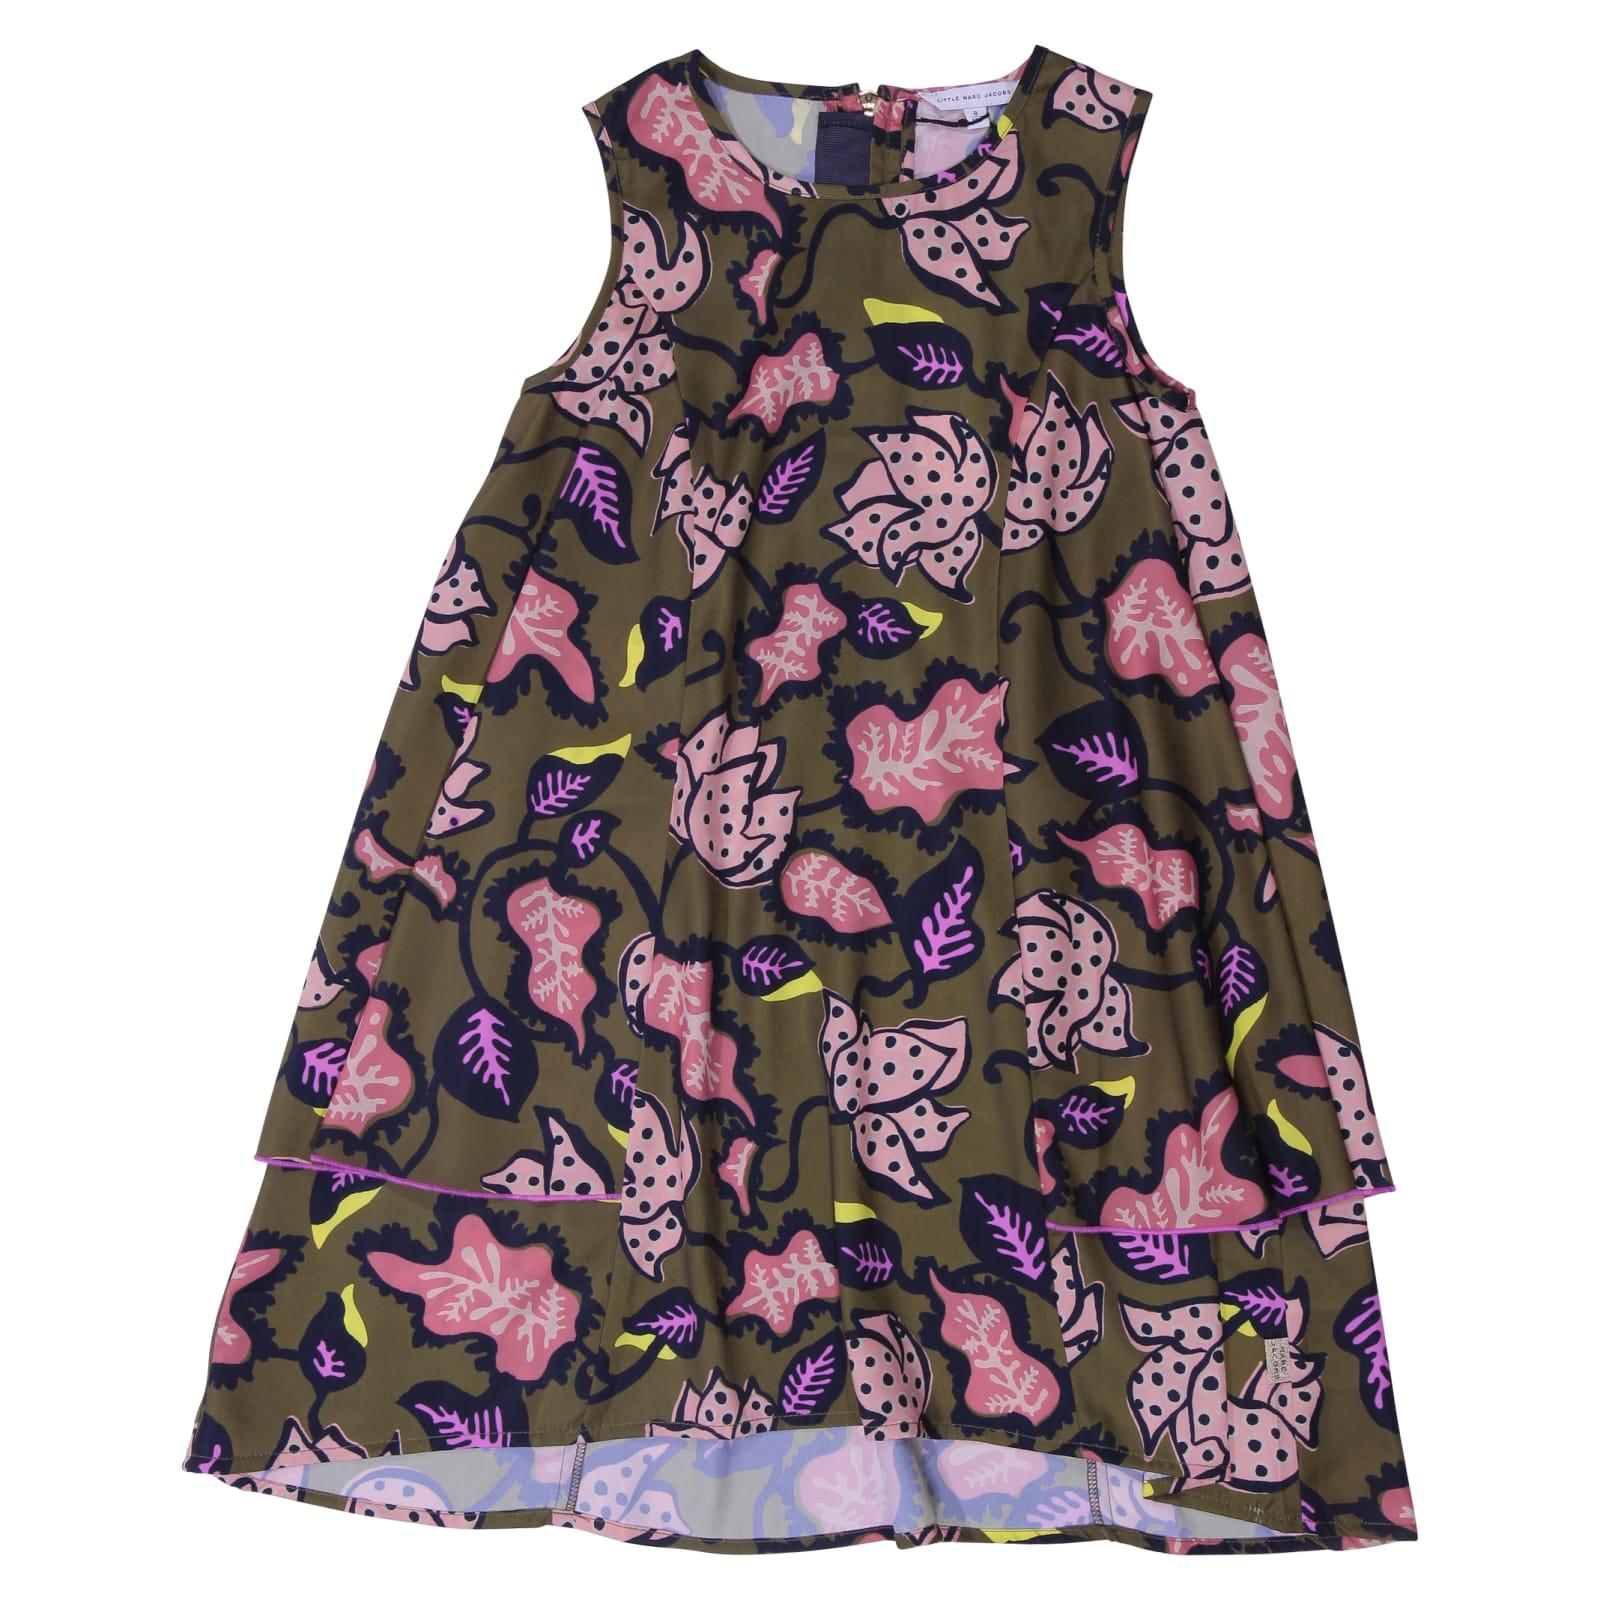 Little Marc Jacobs Floral Print Green Dress